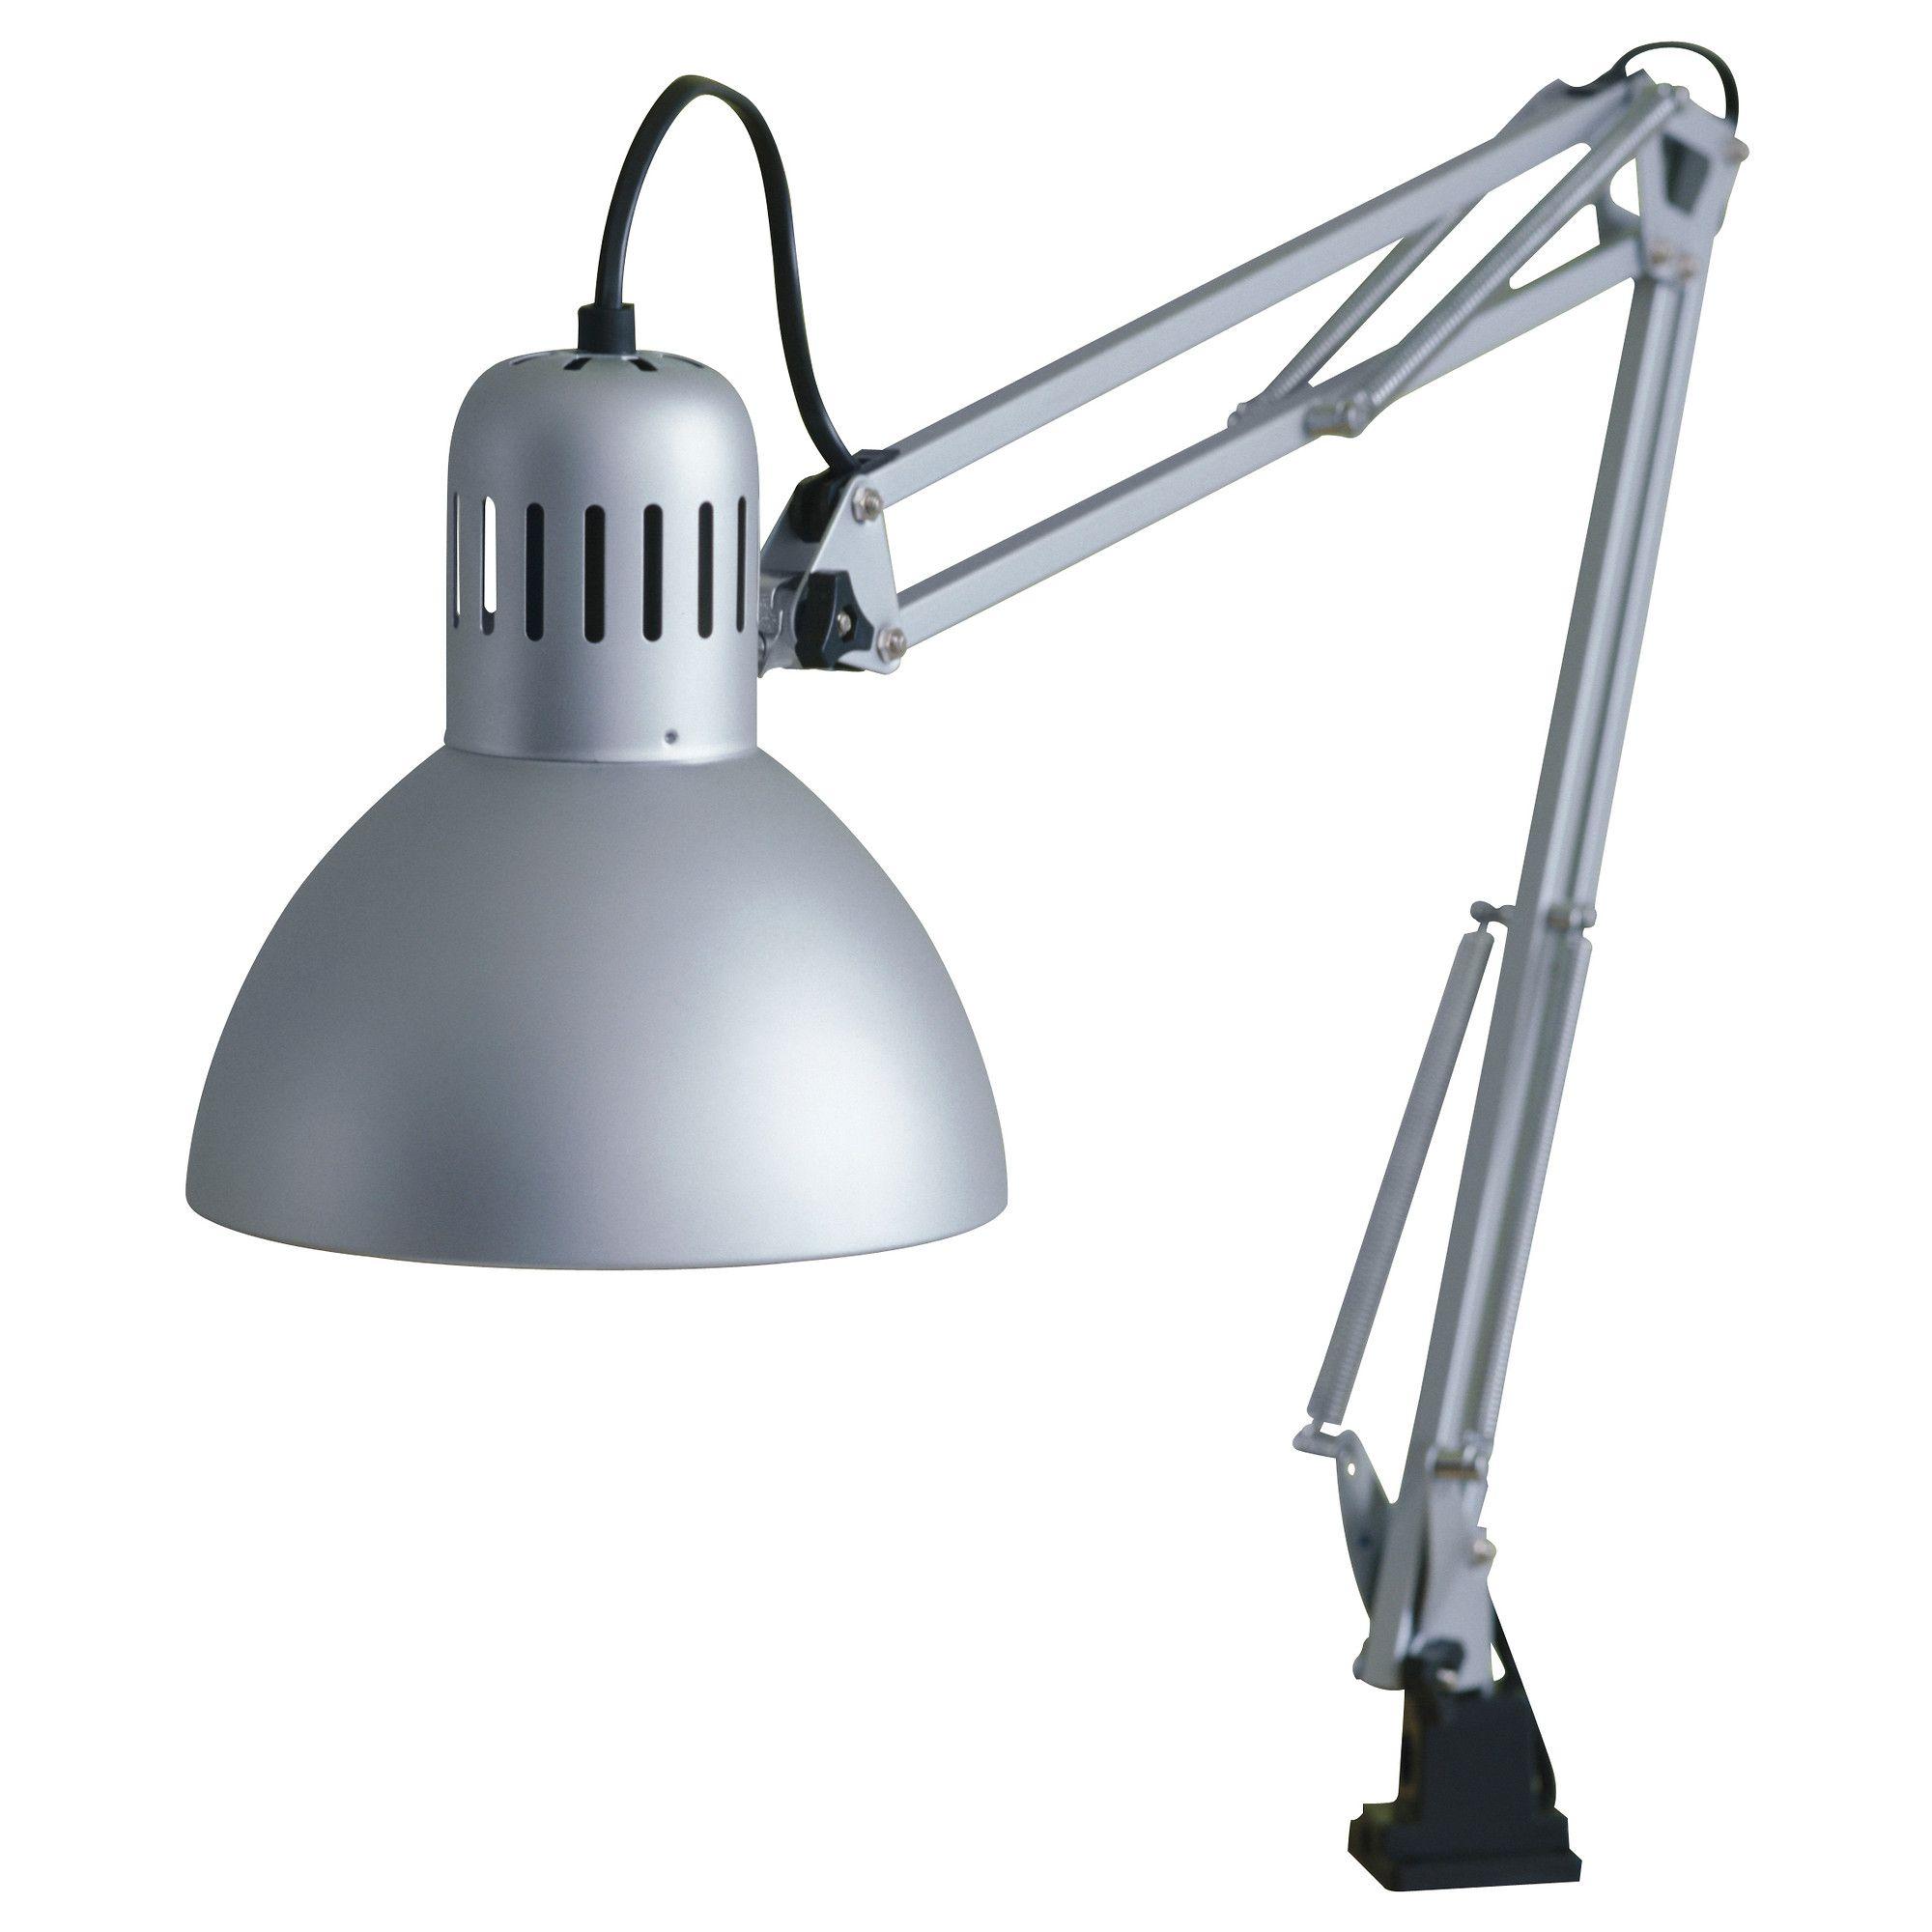 Ikea Tertial Adjustable Work Light Clamp On Desk Garage: TERTIAL Work Lamp - IKEA